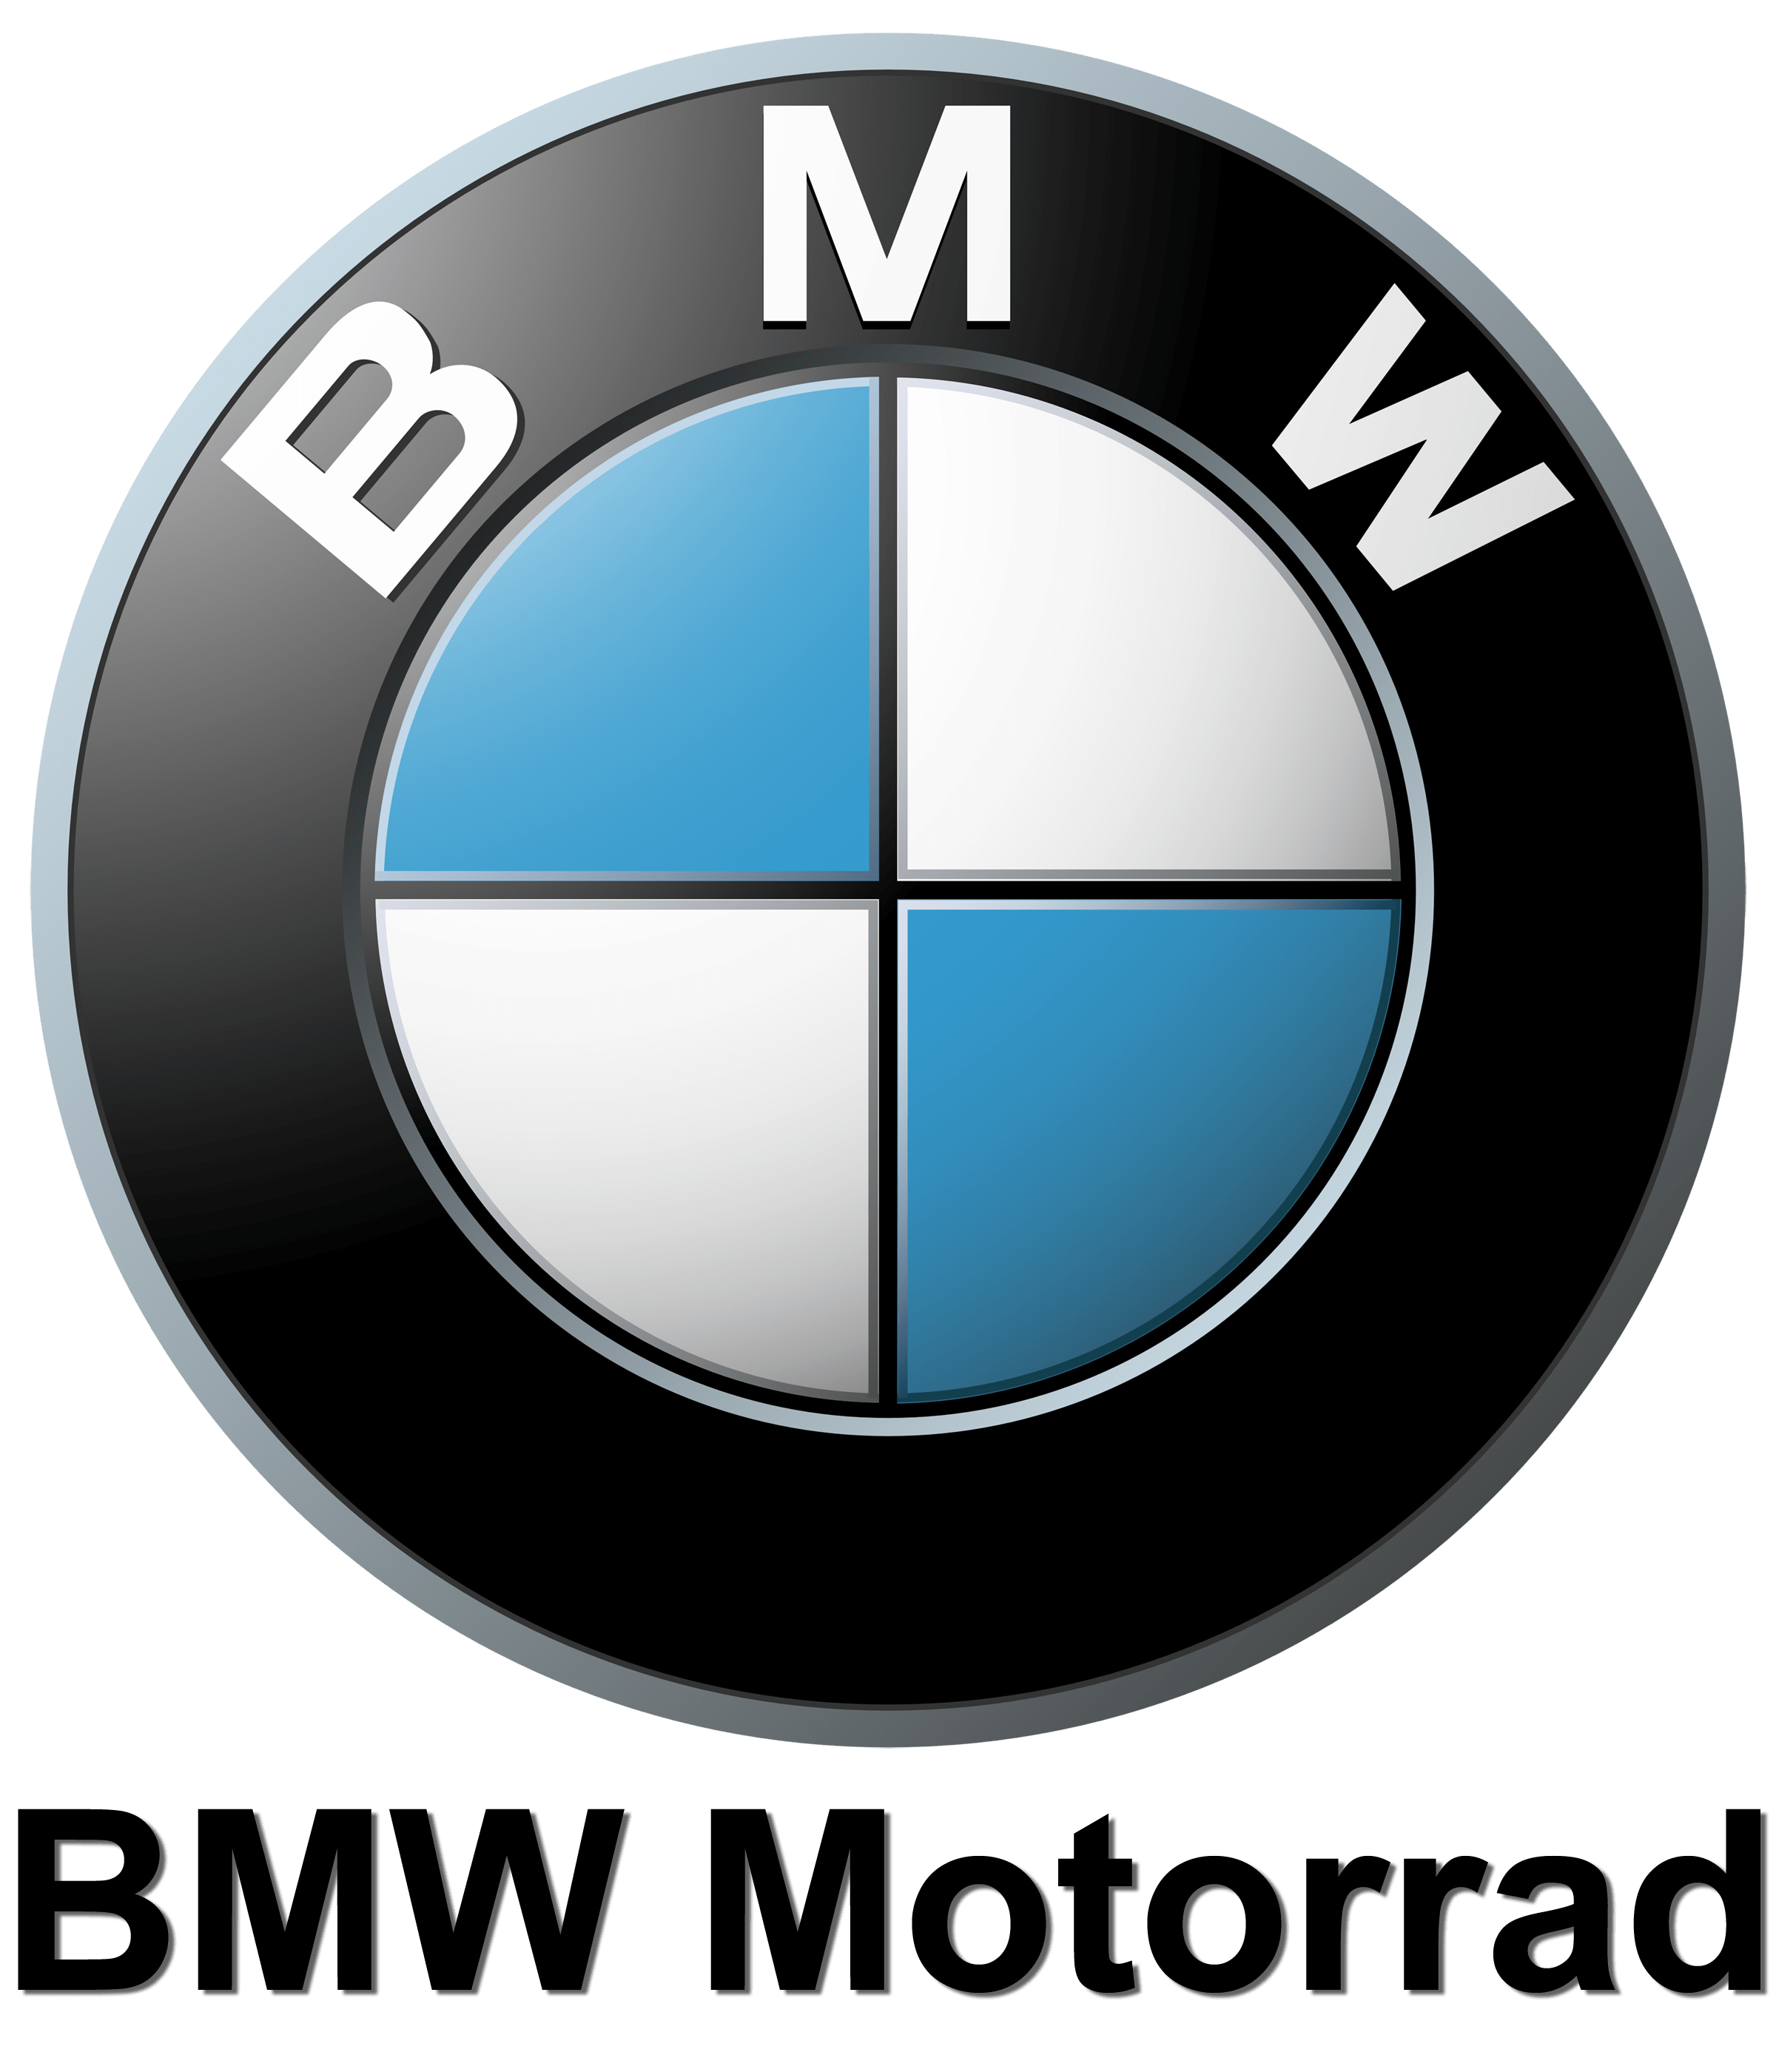 BMW Motorcycle Logo Bmw エンブレム, Bmw ロゴ, カーエンブレム